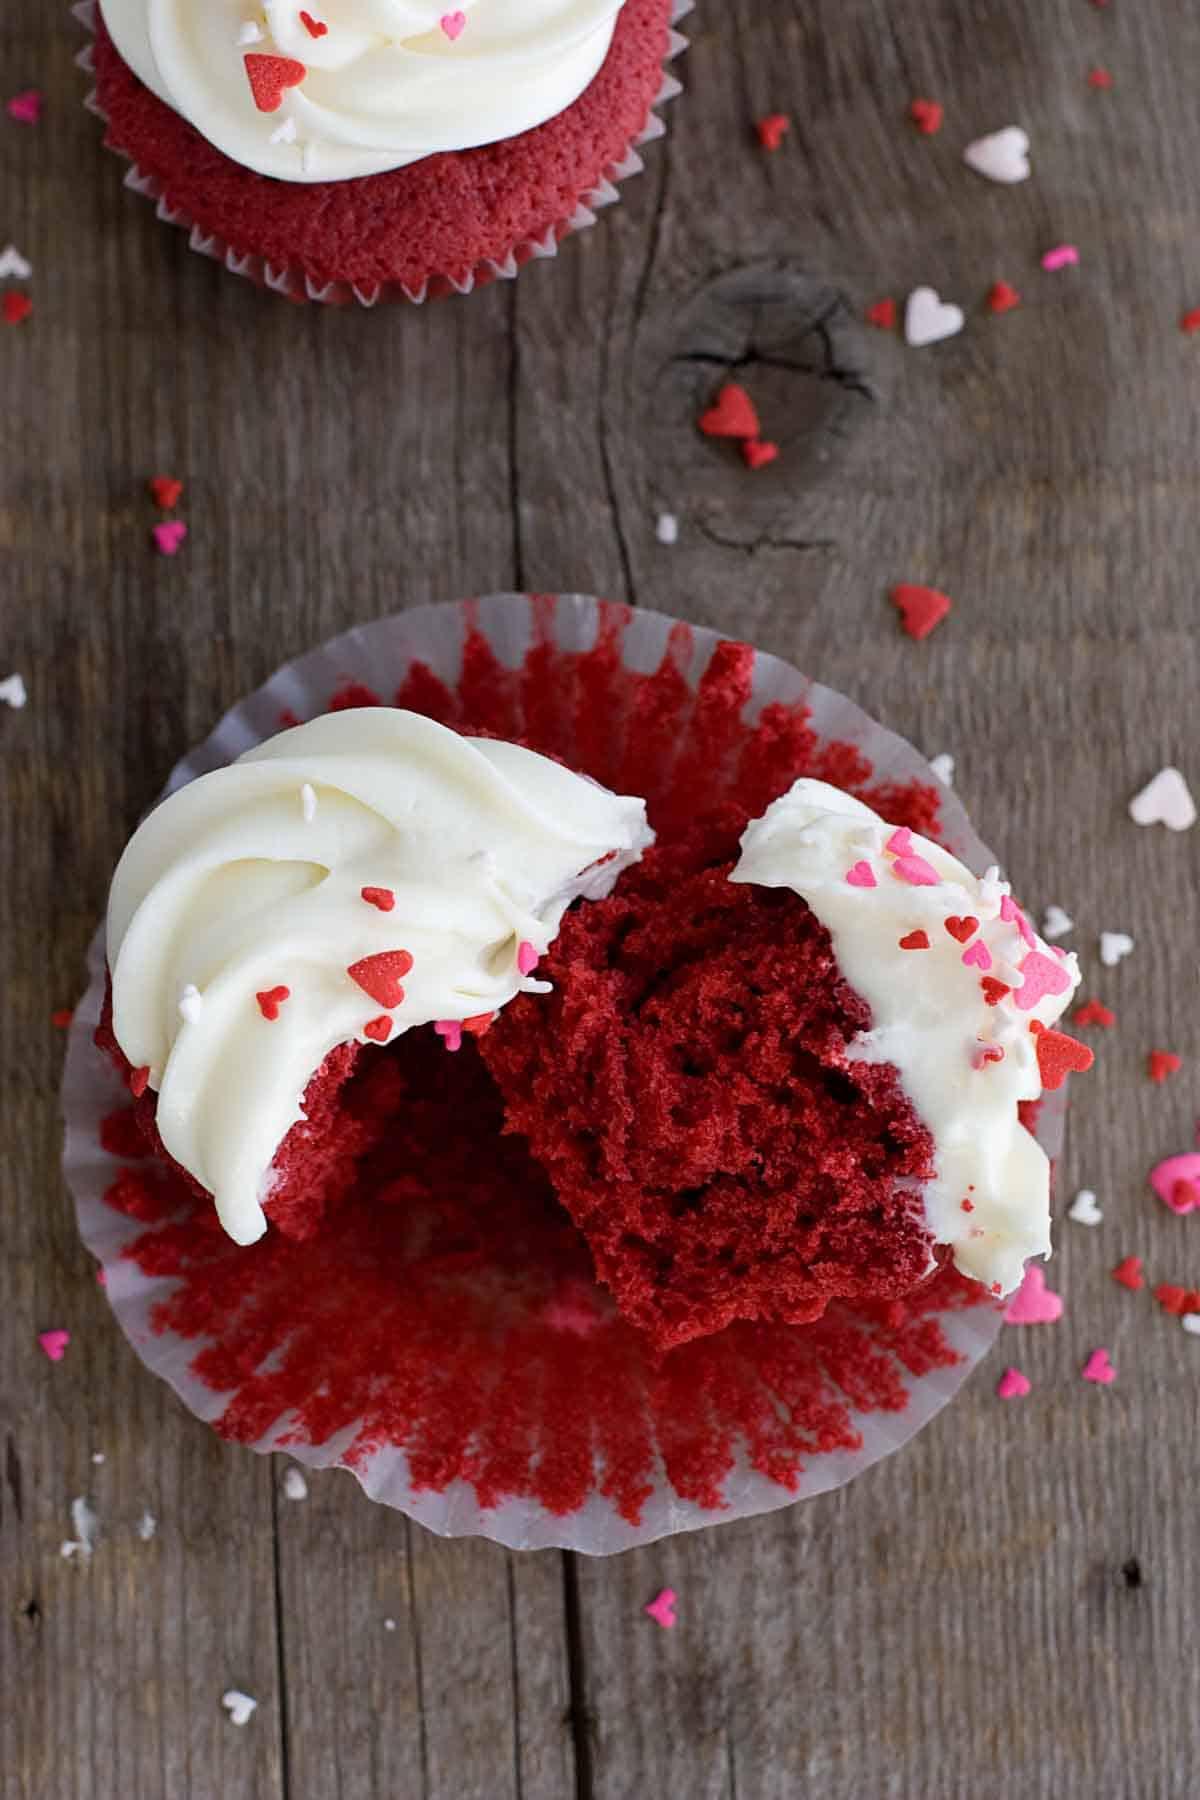 Texture of Red Velvet Cupcakes